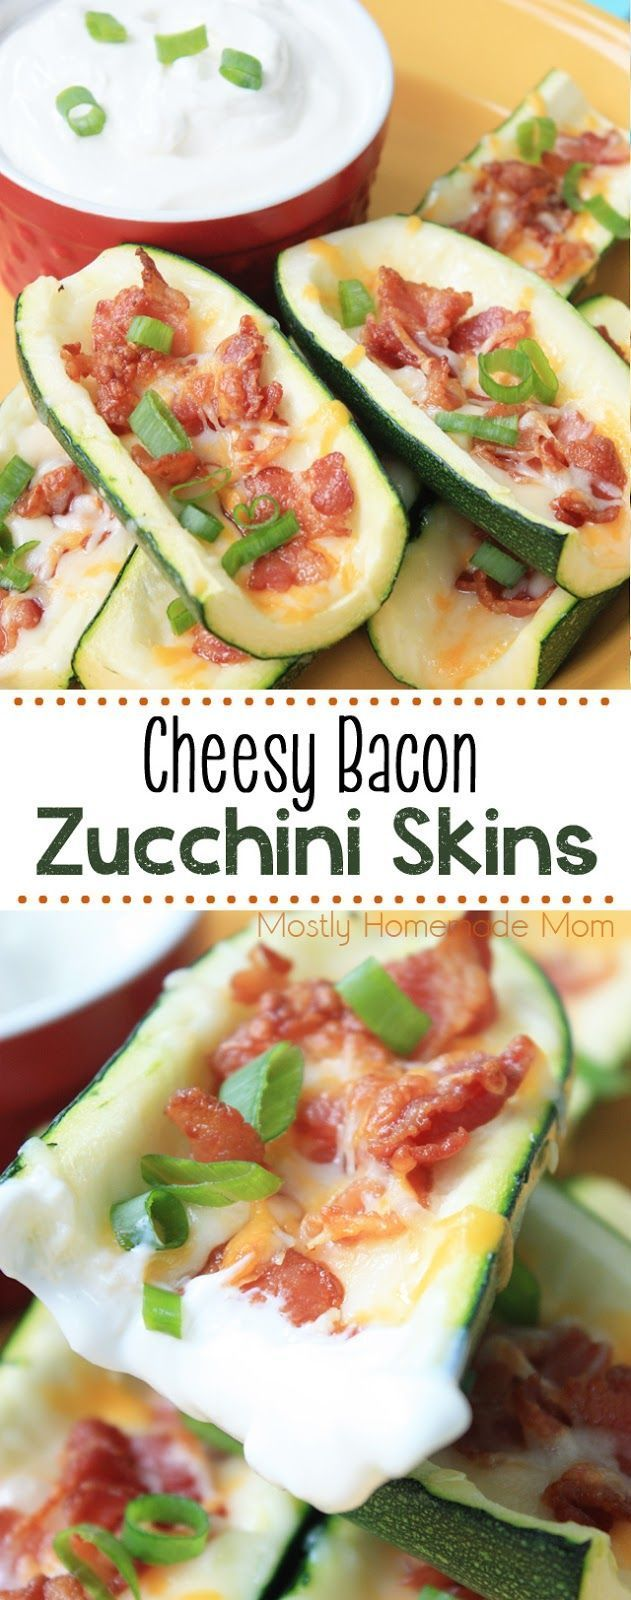 Cheesy Bacon Zucchini Skins